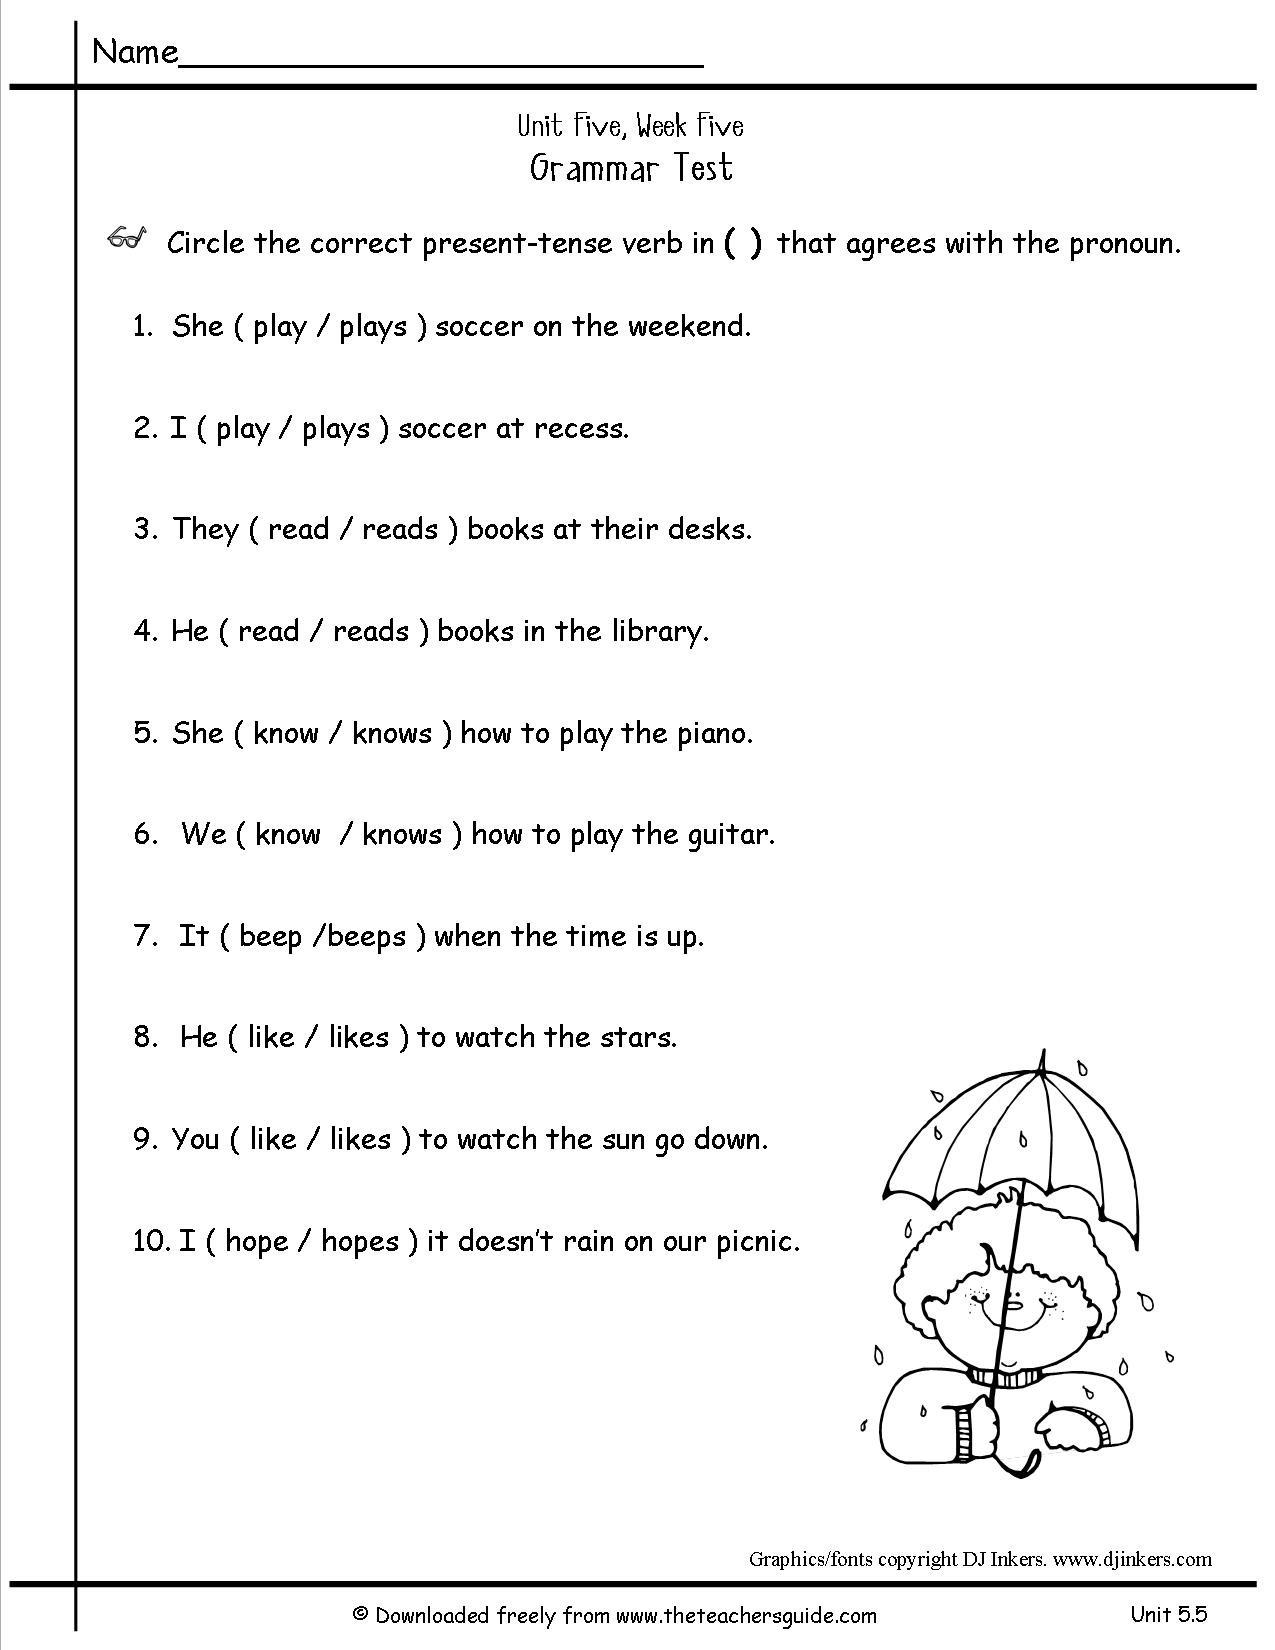 Pronoun Worksheets for 2nd Graders Free Pronoun Worksheet for 2nd Grade